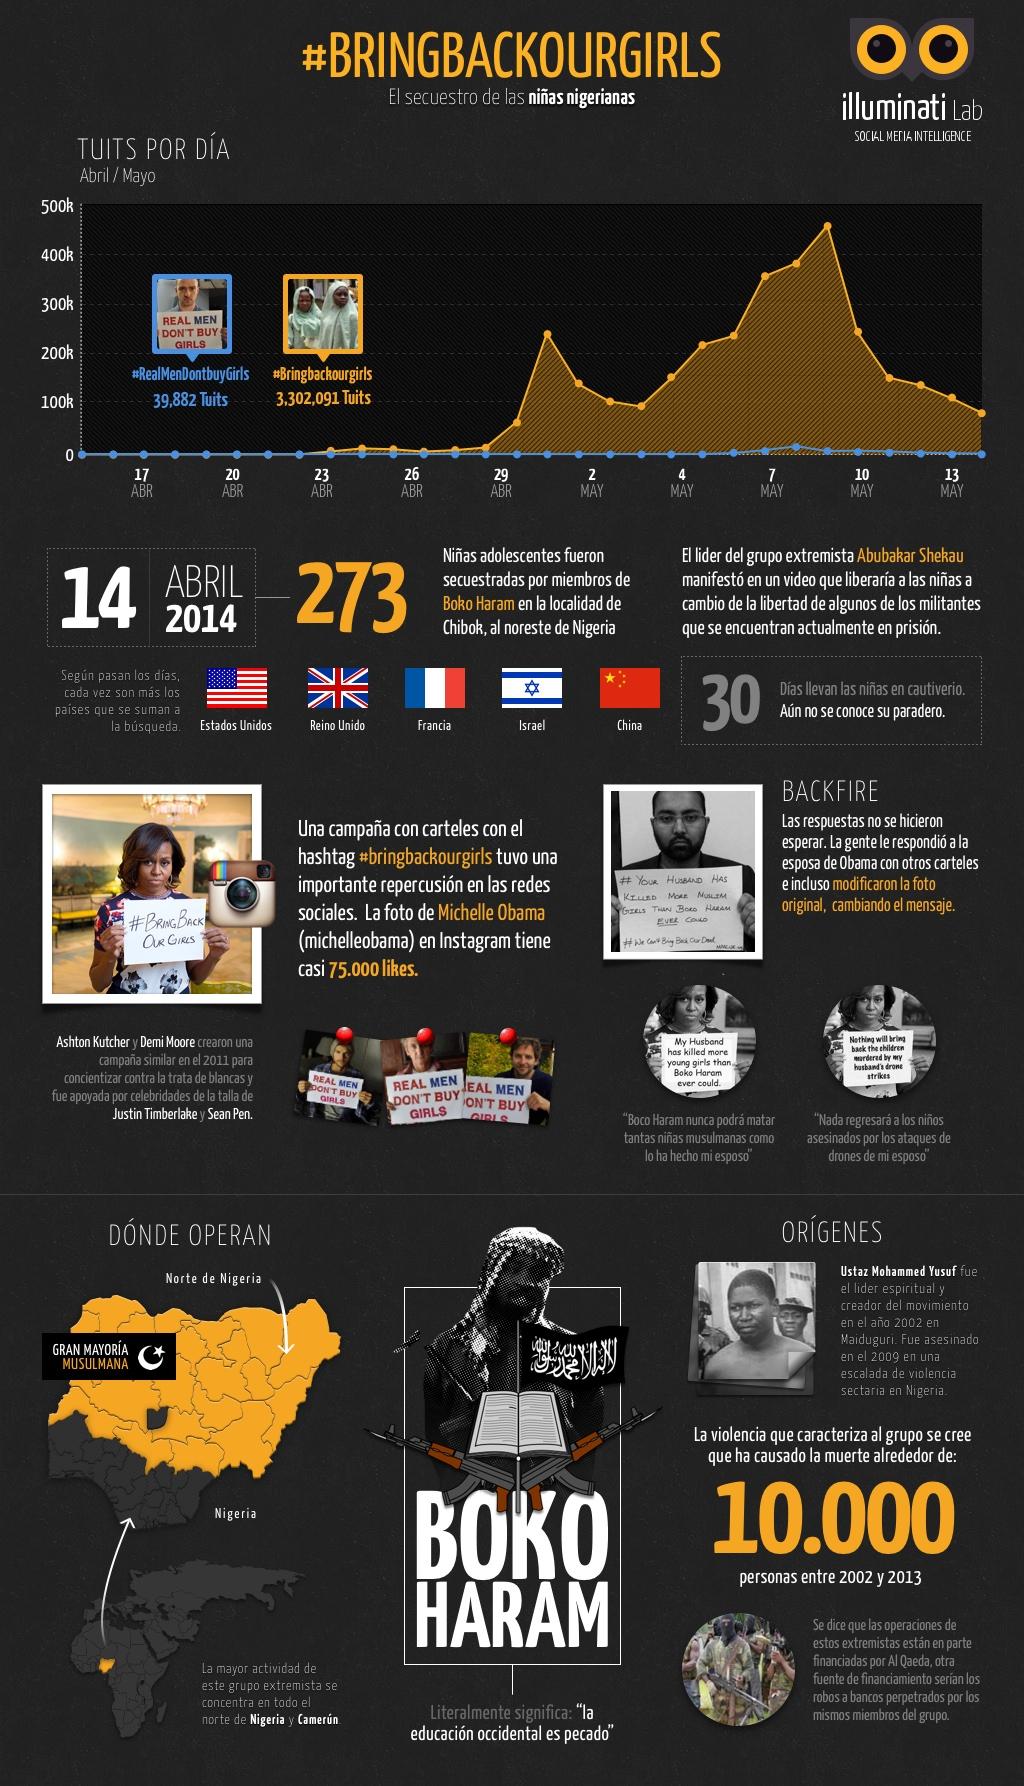 infografia-bring-back-the-girls